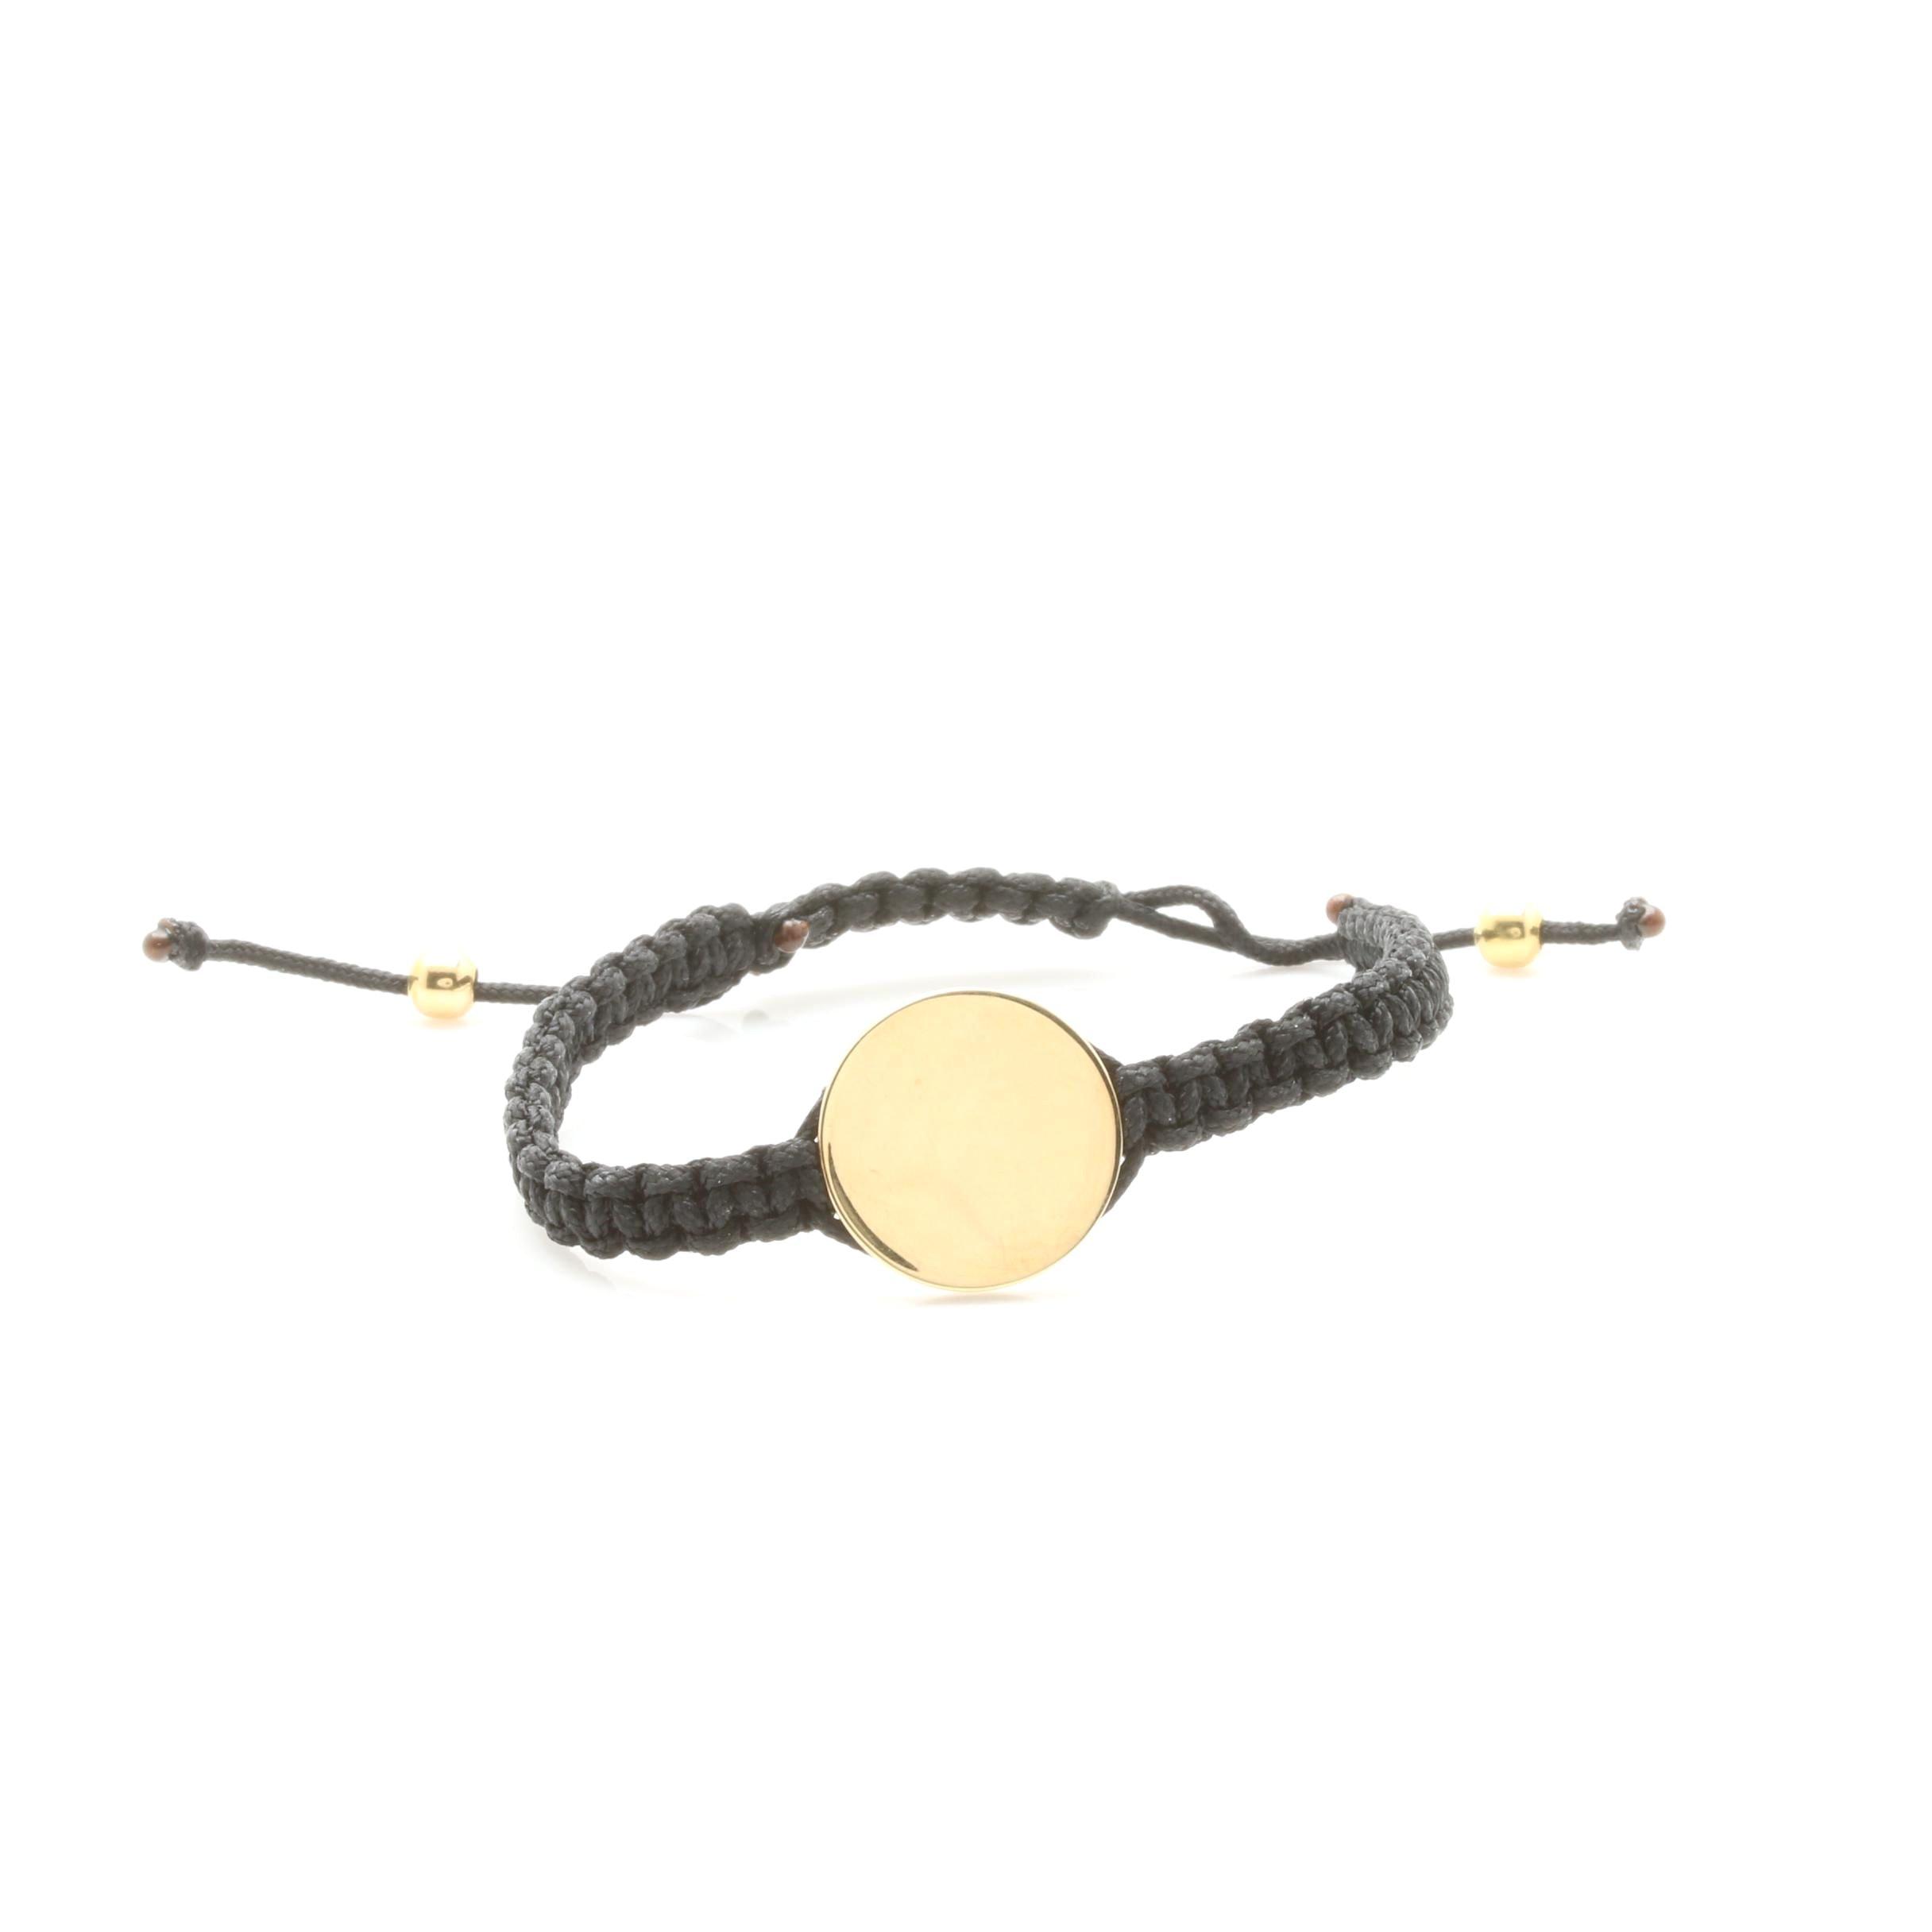 14K Yellow Gold Adjustable Macrame Bracelet